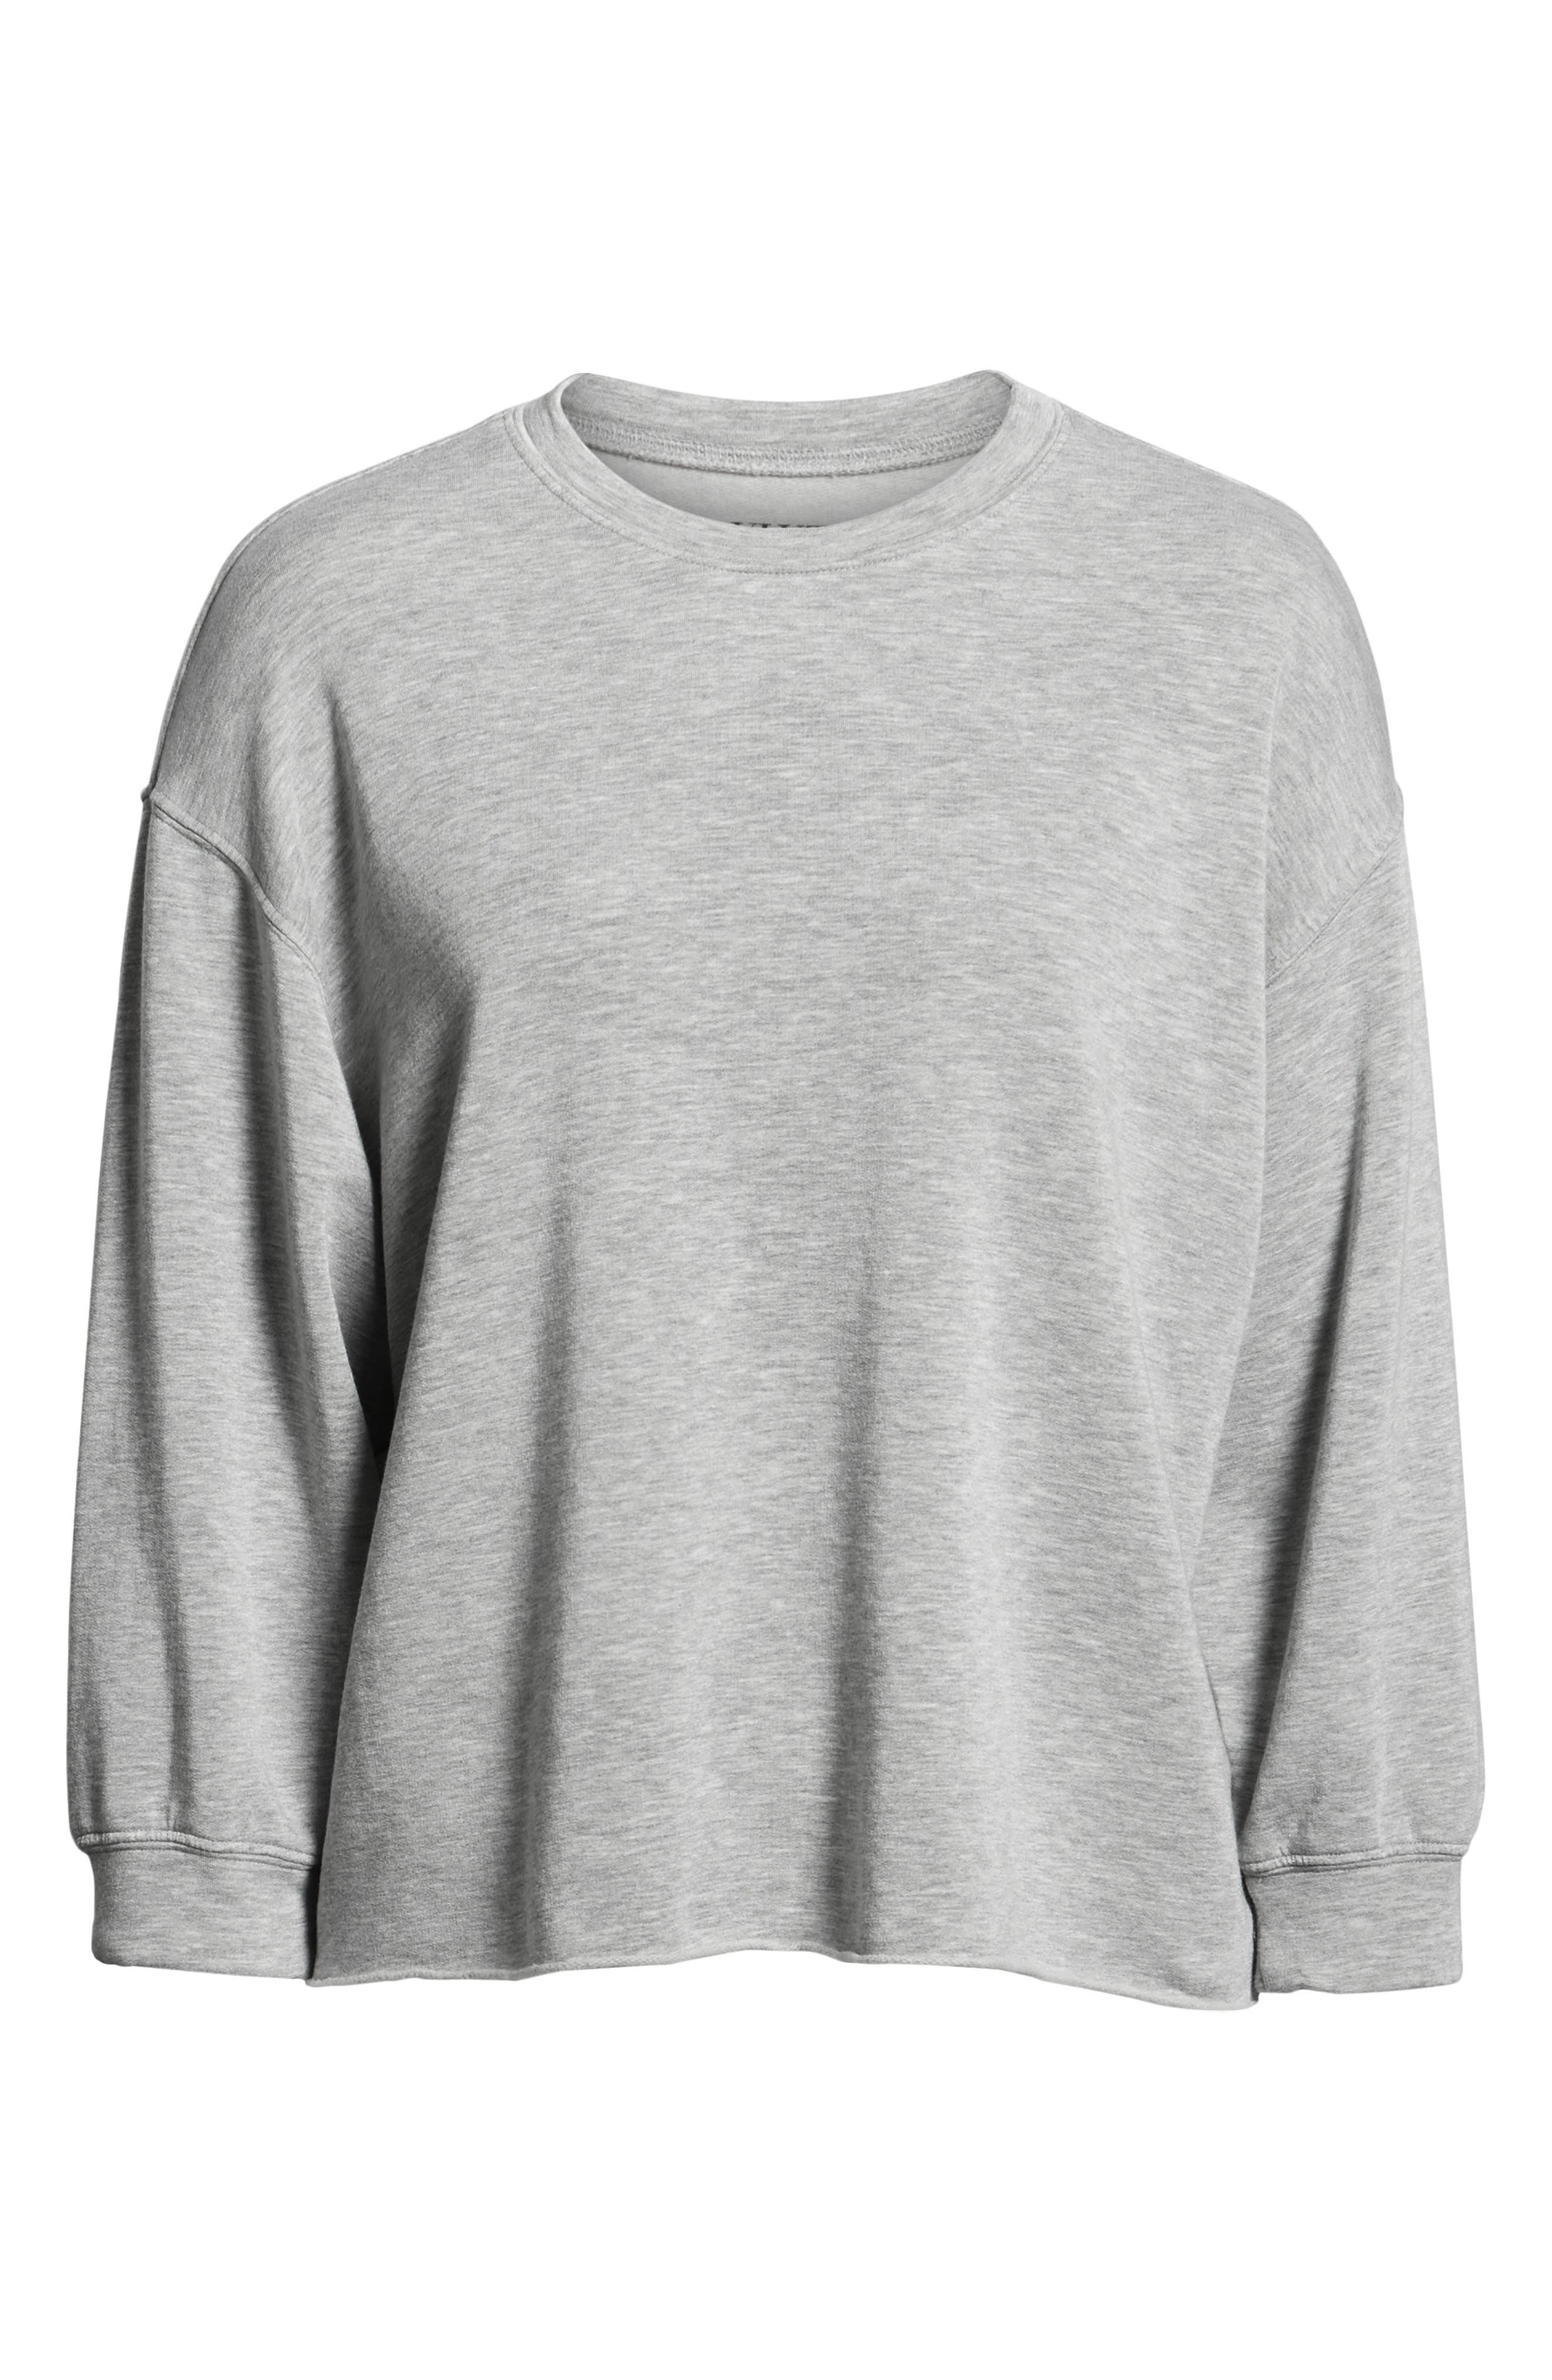 Raw Hem Sweatshirt,                             Alternate thumbnail 6, color,                             HEATHER GREY